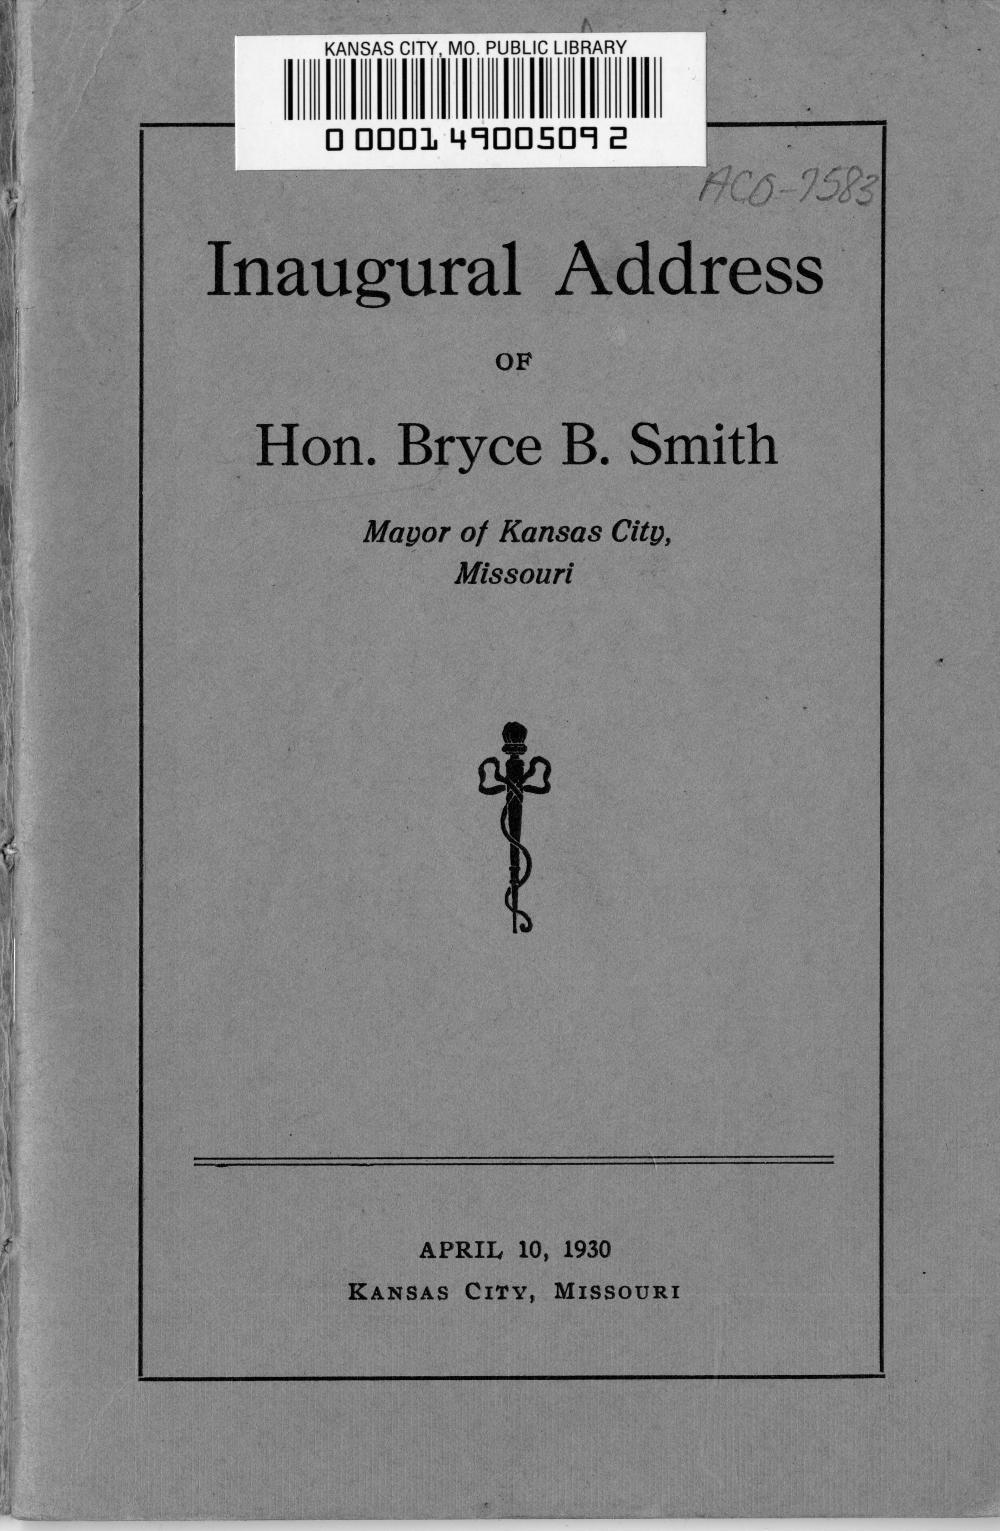 Inaugural Address of Hon. Bryce B. Smith